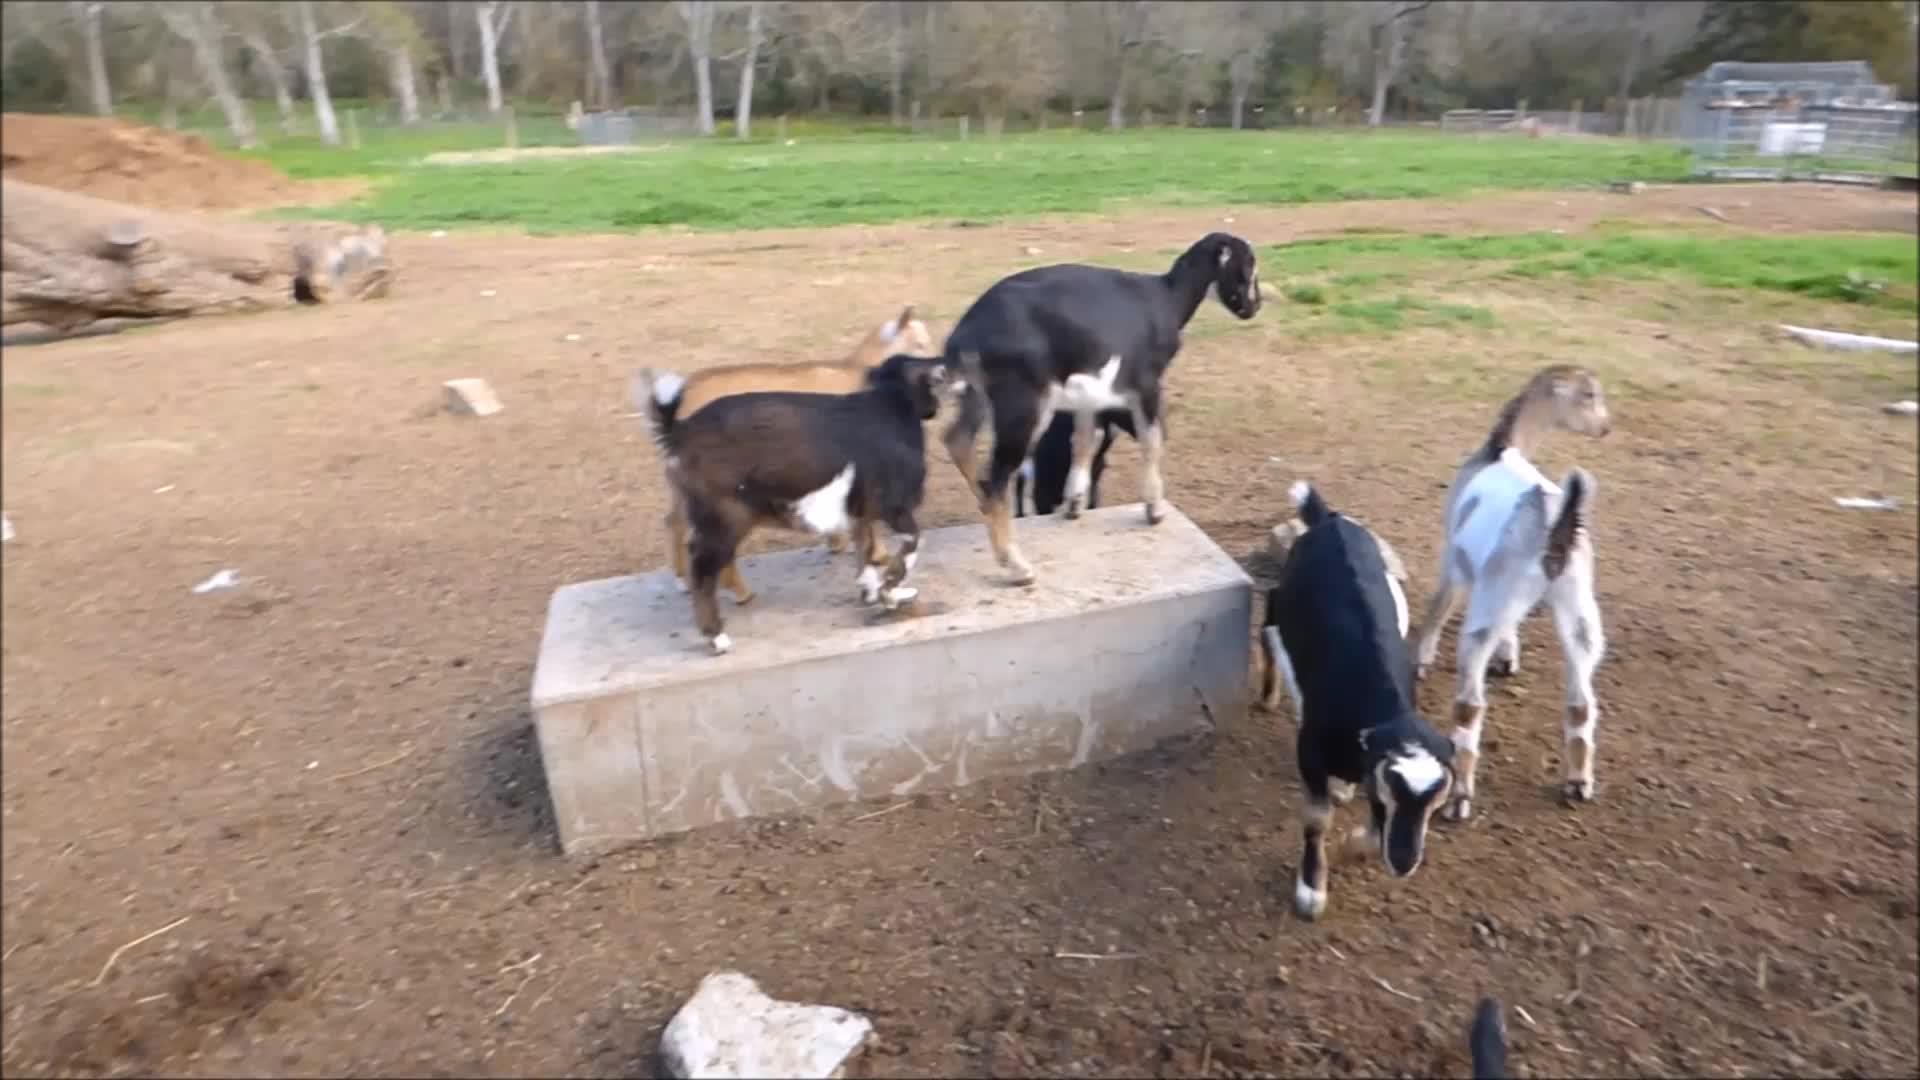 aww, cute, goatparkour, knsfarm, Wriggle Jump GIFs